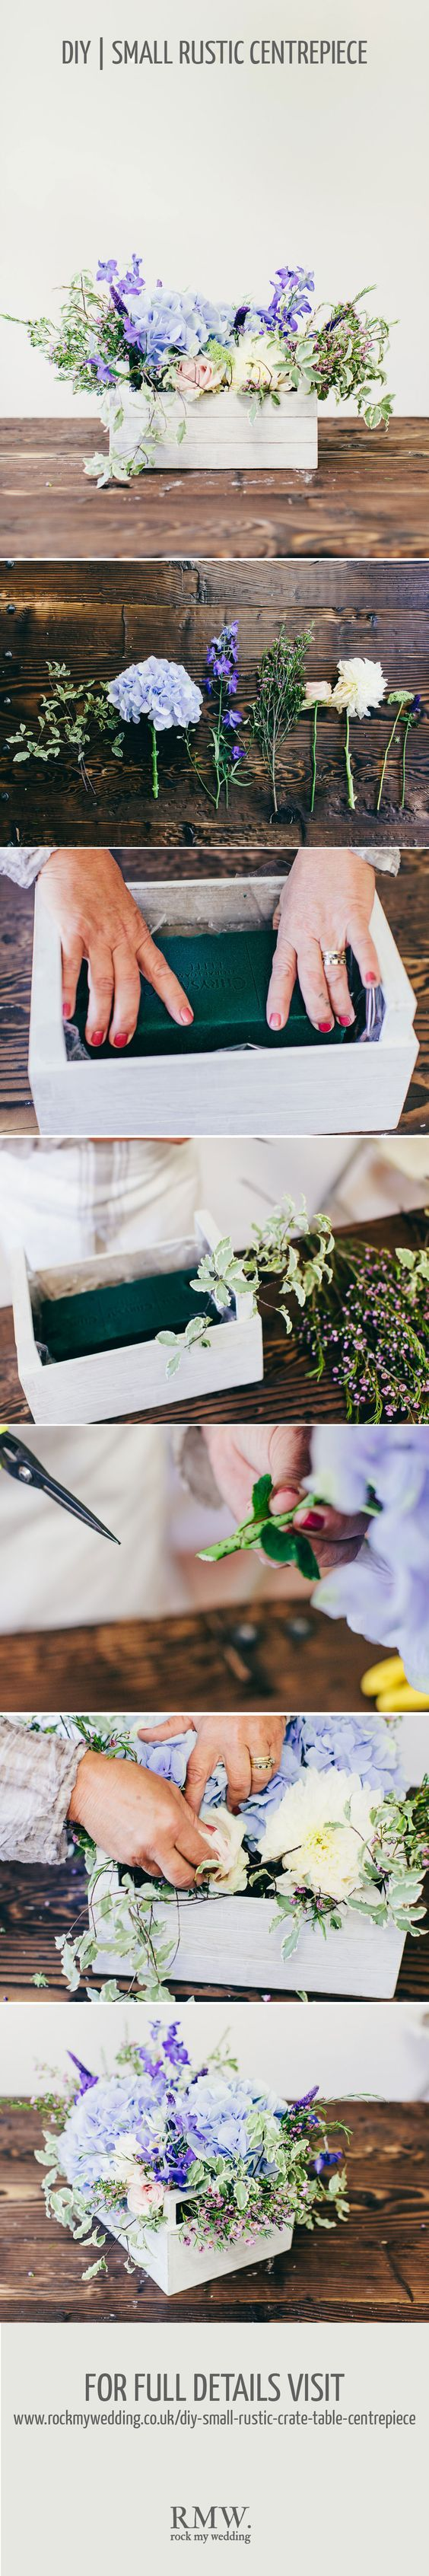 Rustic crate wedding centrepiece DIY tutorial / http://www.himisspuff.com/diy-wedding-centerpieces-on-a-budget/42/